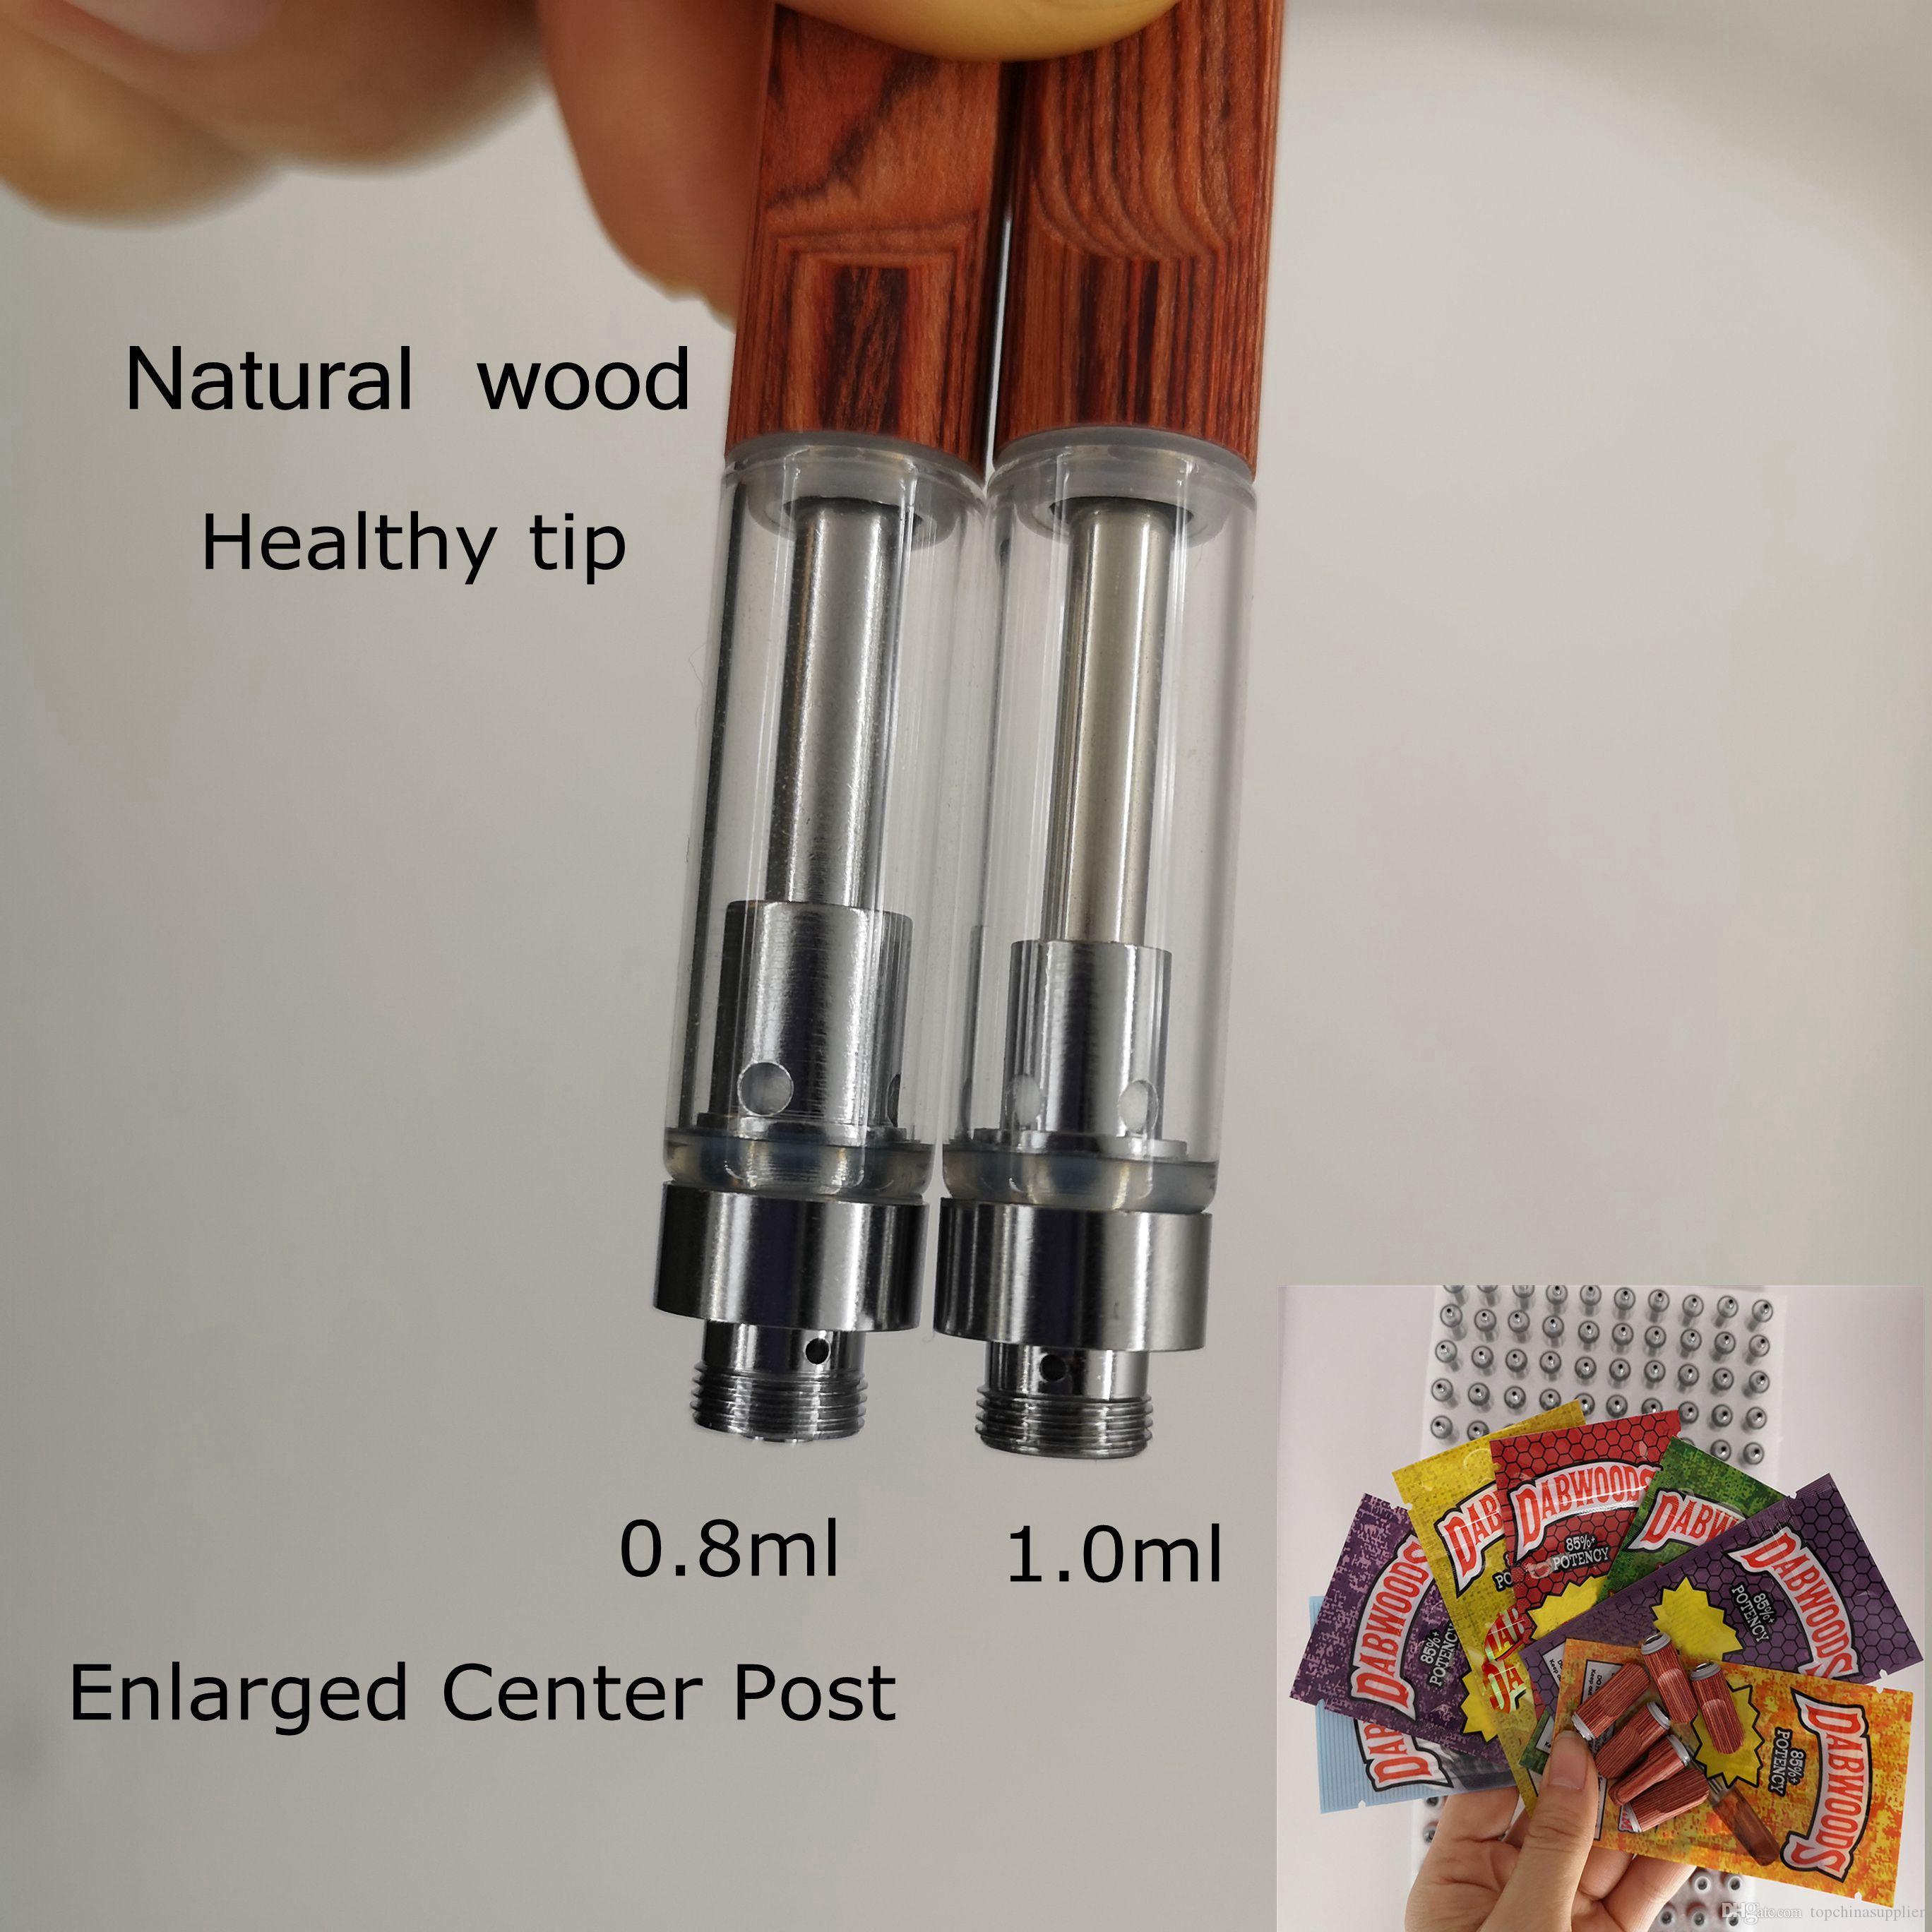 Wood Tips Vape Cartridges Ceramic Coil Dabwoods Packaging 0.8ml 1.0ml Vaporizer Pens Empty Retail Bags Health Woods Carts